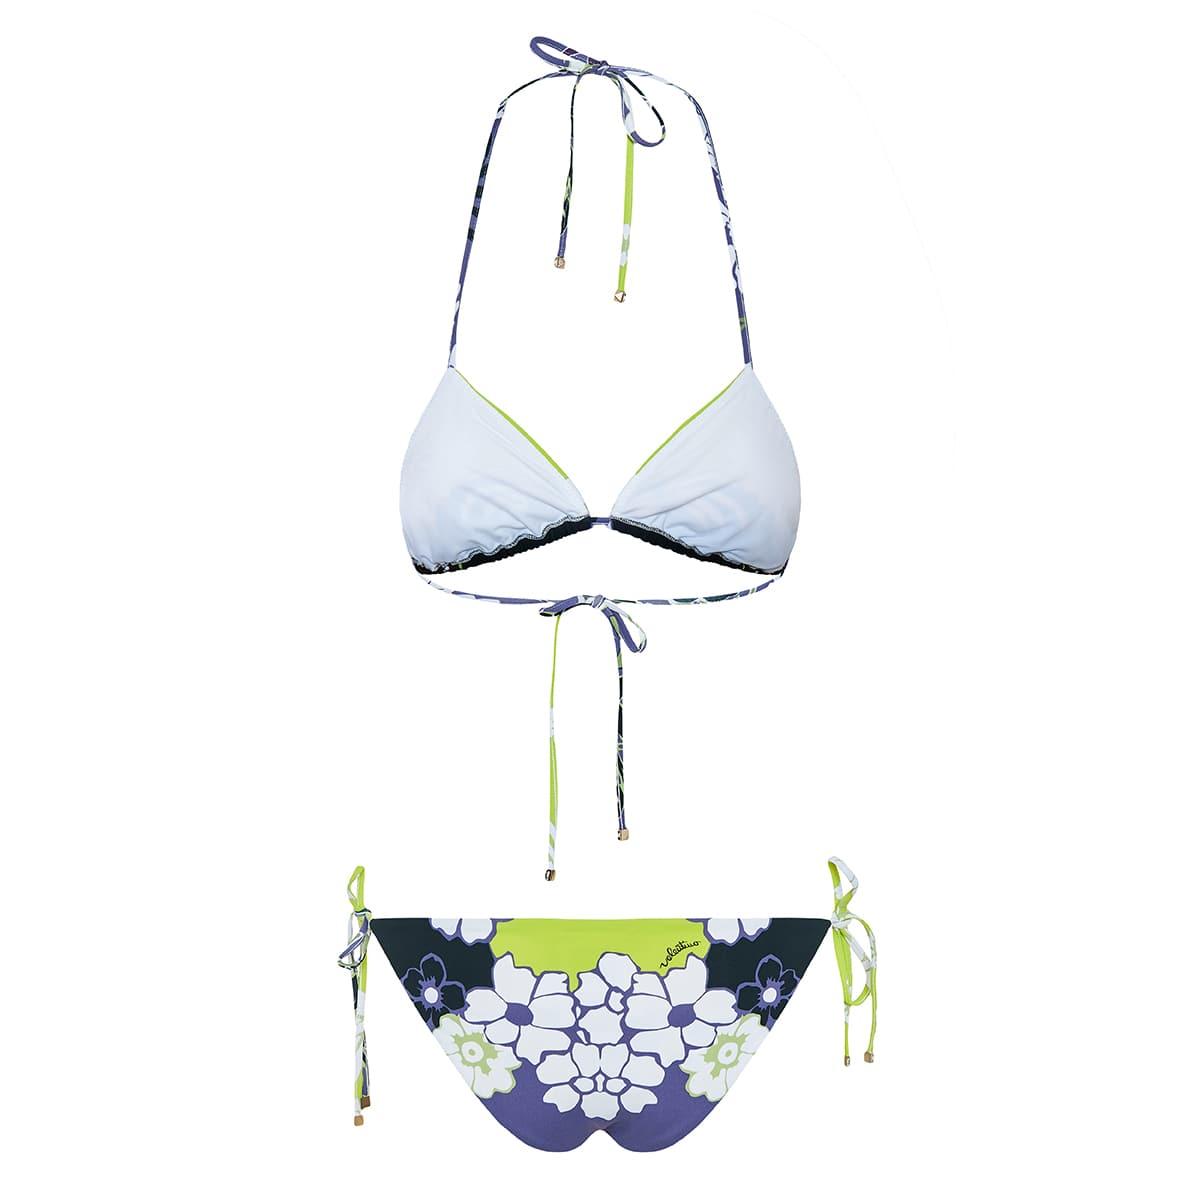 Printed bikini with ties